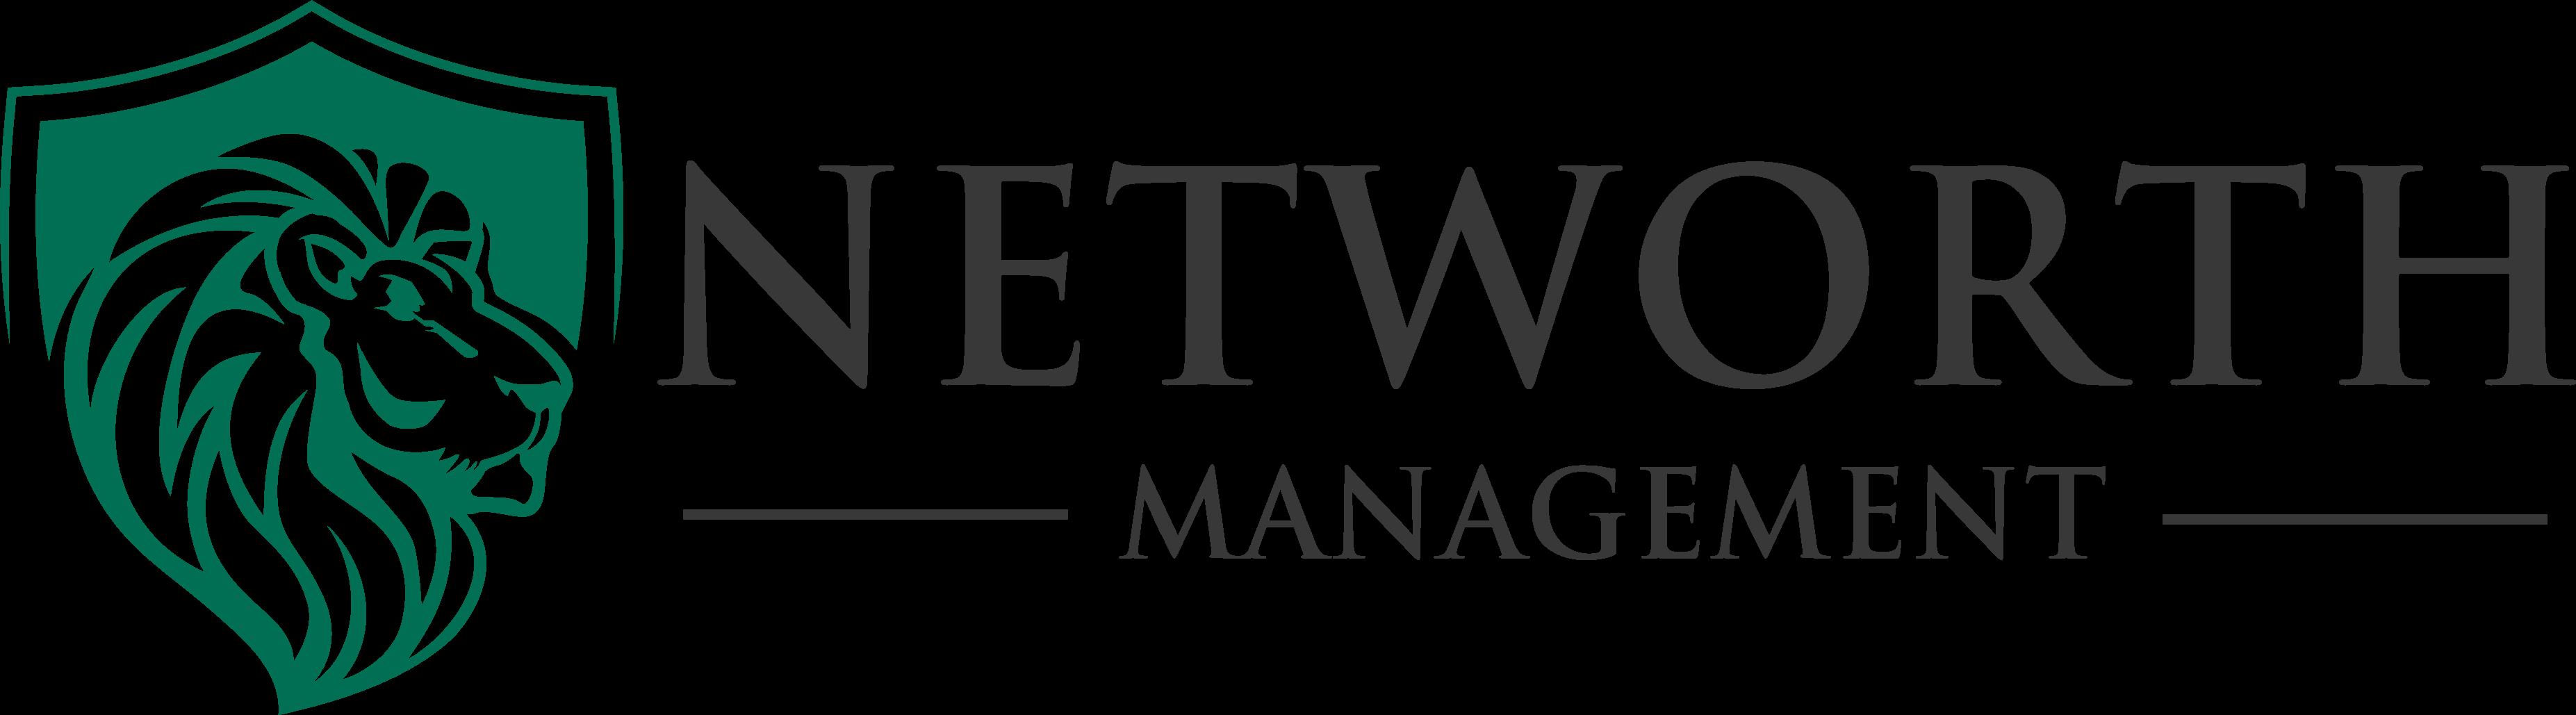 Networth Standard